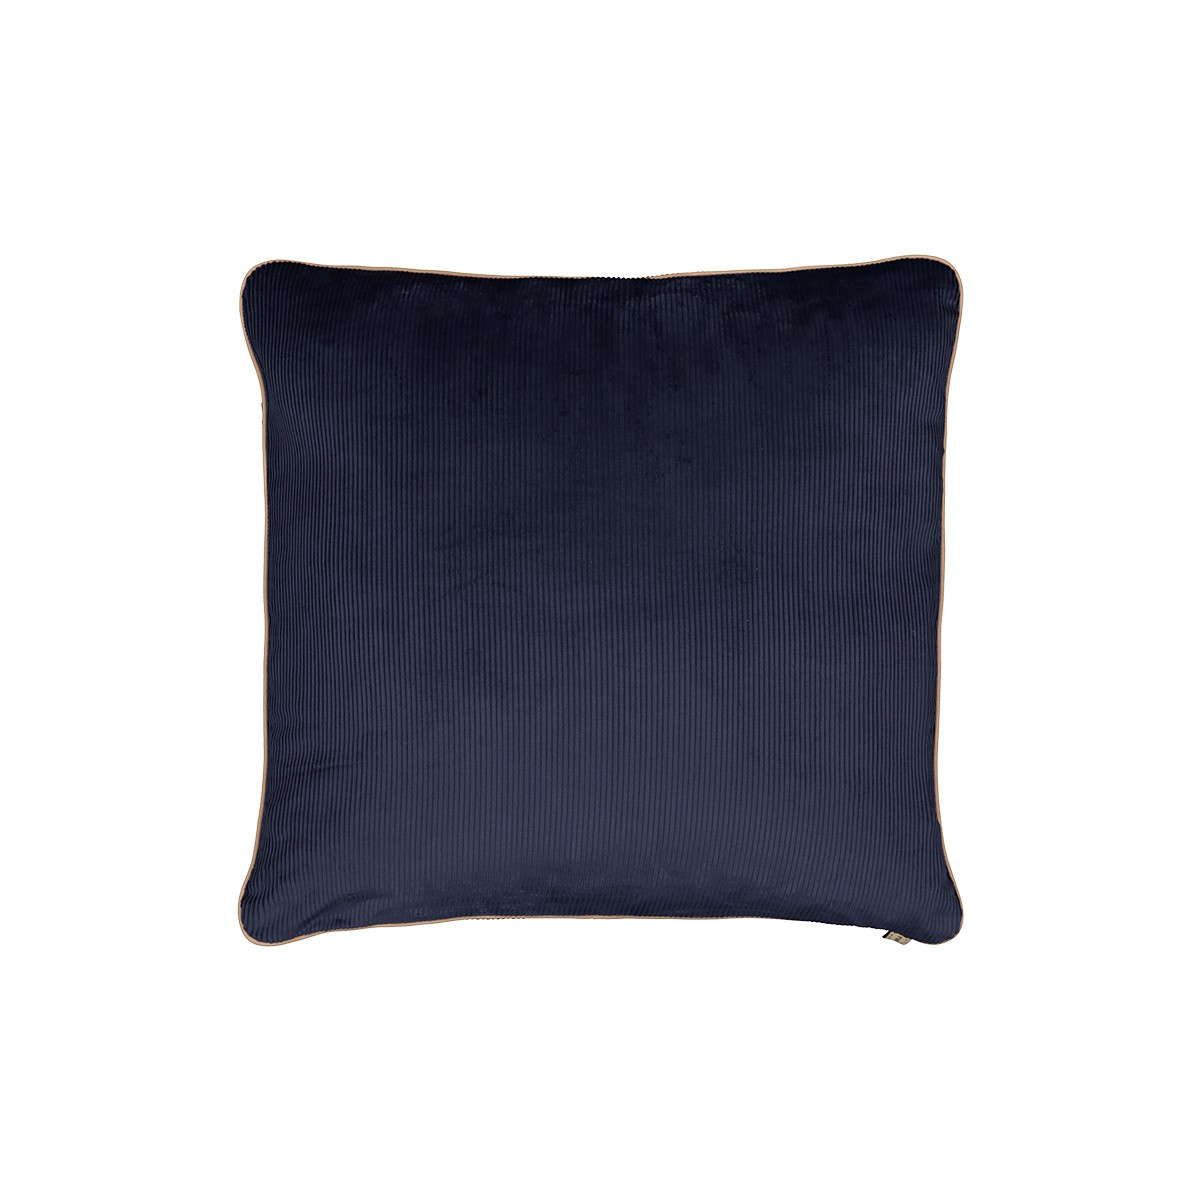 Coussin Carino bleu marine